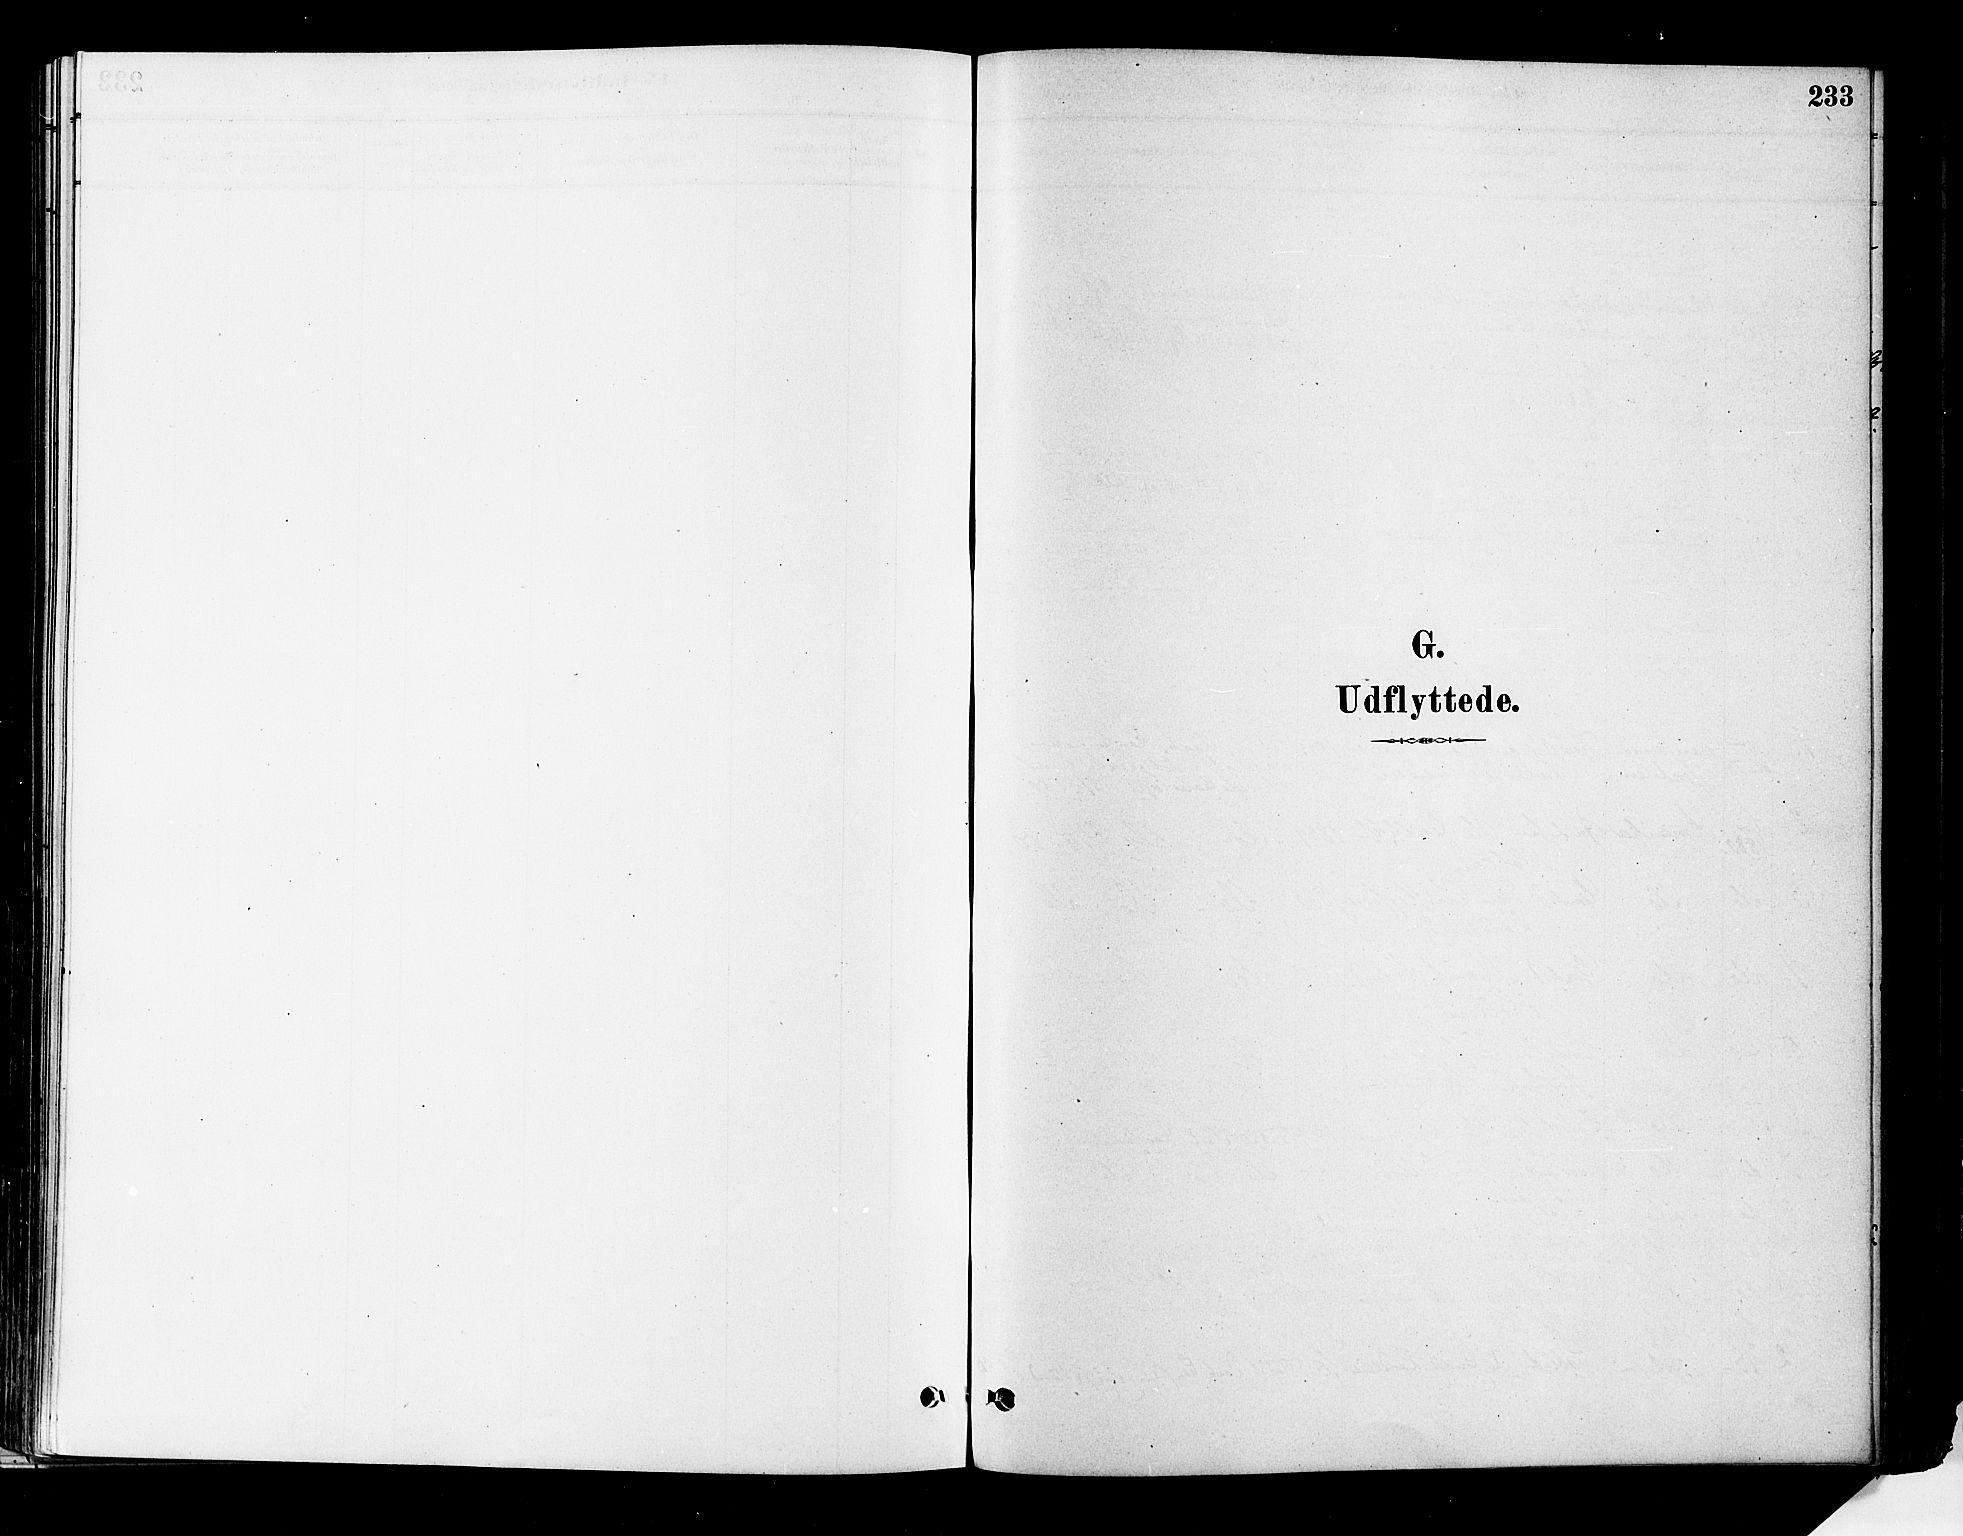 SAKO, Flesberg kirkebøker, F/Fa/L0008: Ministerialbok nr. I 8, 1879-1899, s. 233